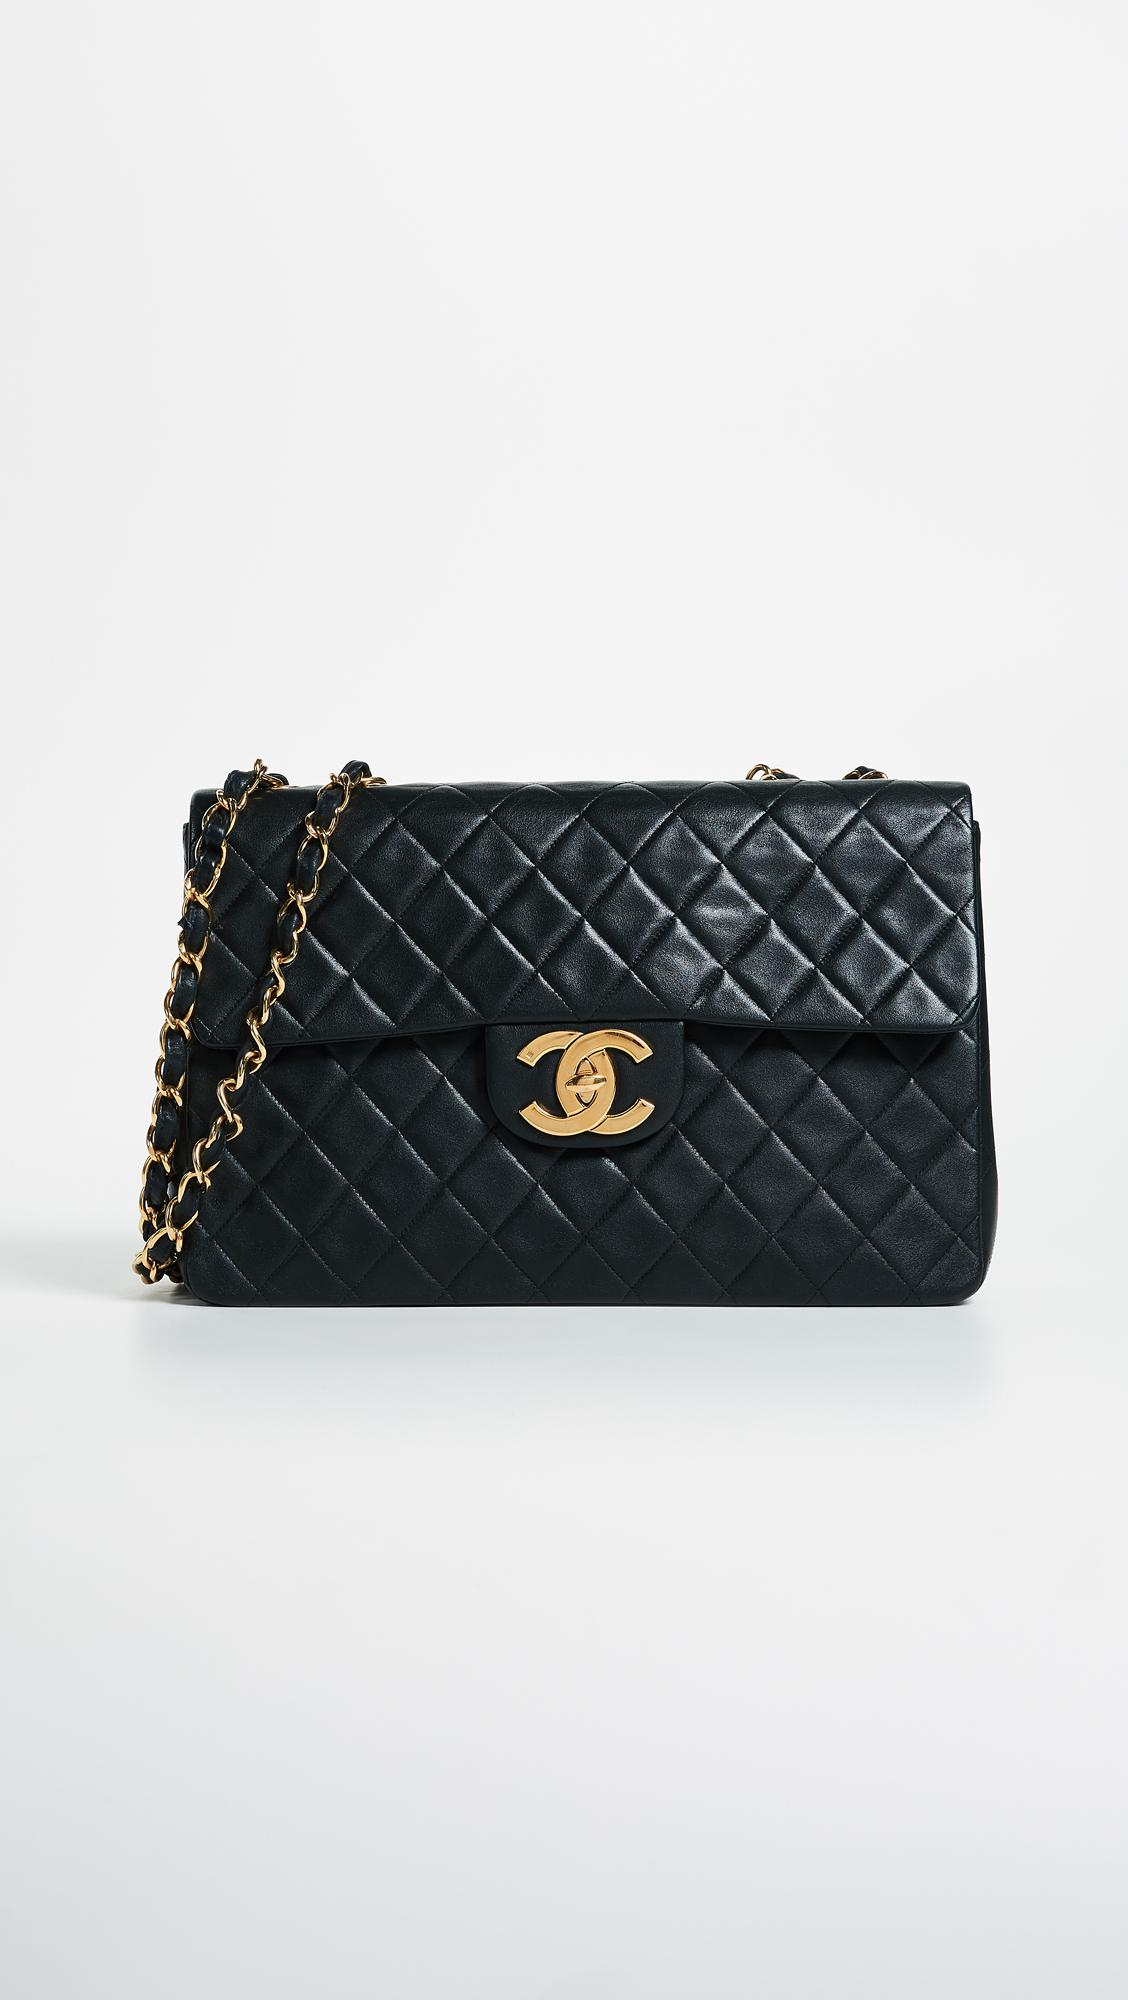 What Goes Around Comes Around. Women s Chanel Jumbo 2.55 Shoulder Bag -  Black f02ee443b2e68